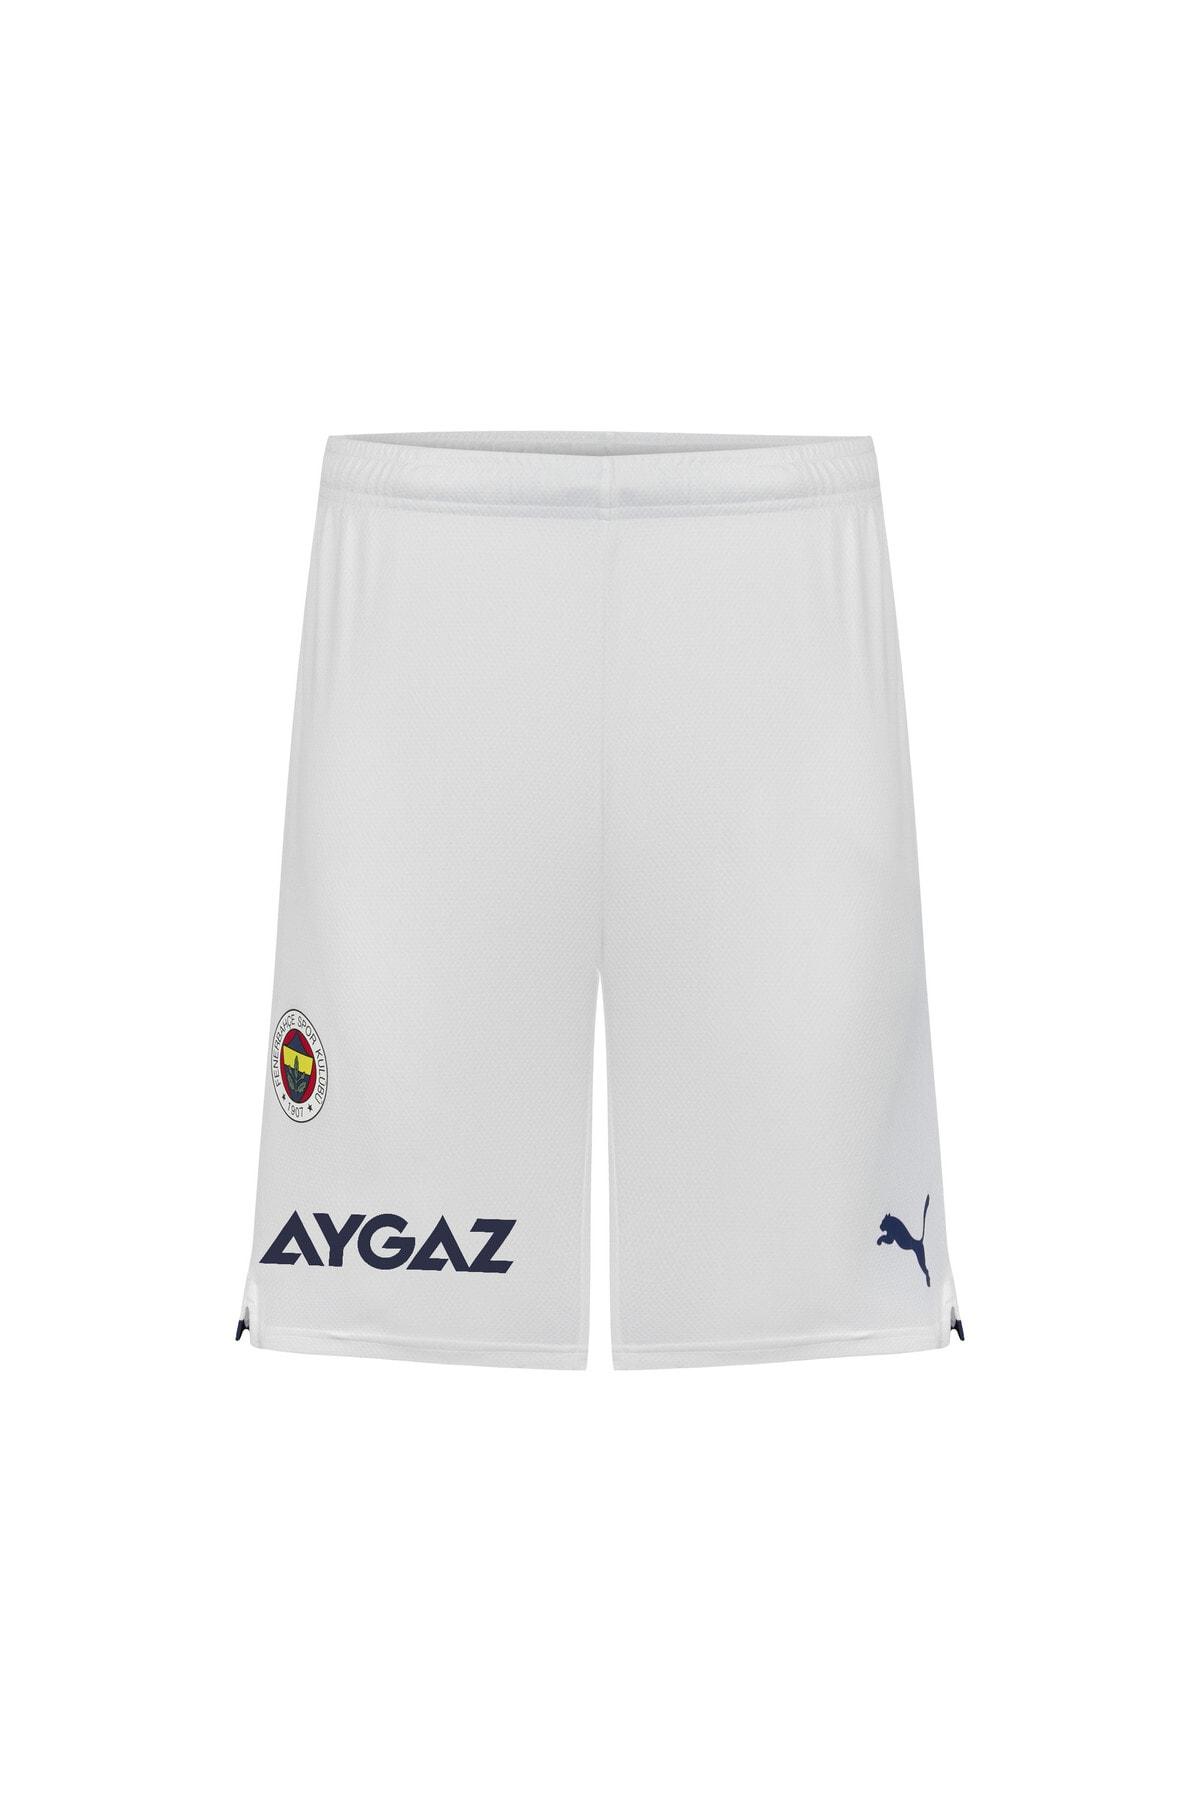 Puma Fenerbahçe Forması Şort 76700504